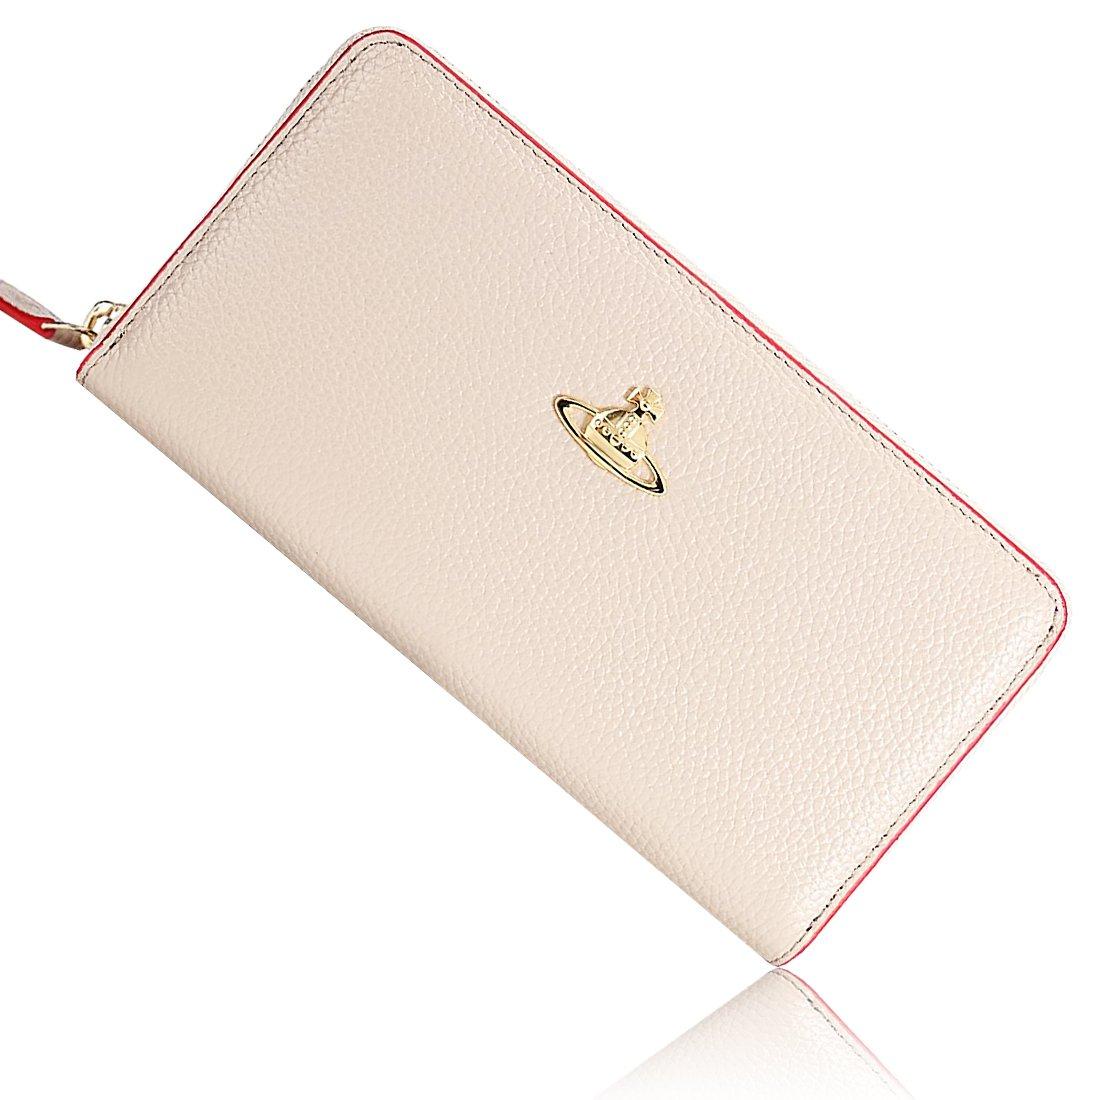 Vivienne Westwood ヴィヴィアン ウエストウッド 財布 レディース ブランド 人気 [並行輸入品] (55339,WHITE) B0782J3JNN